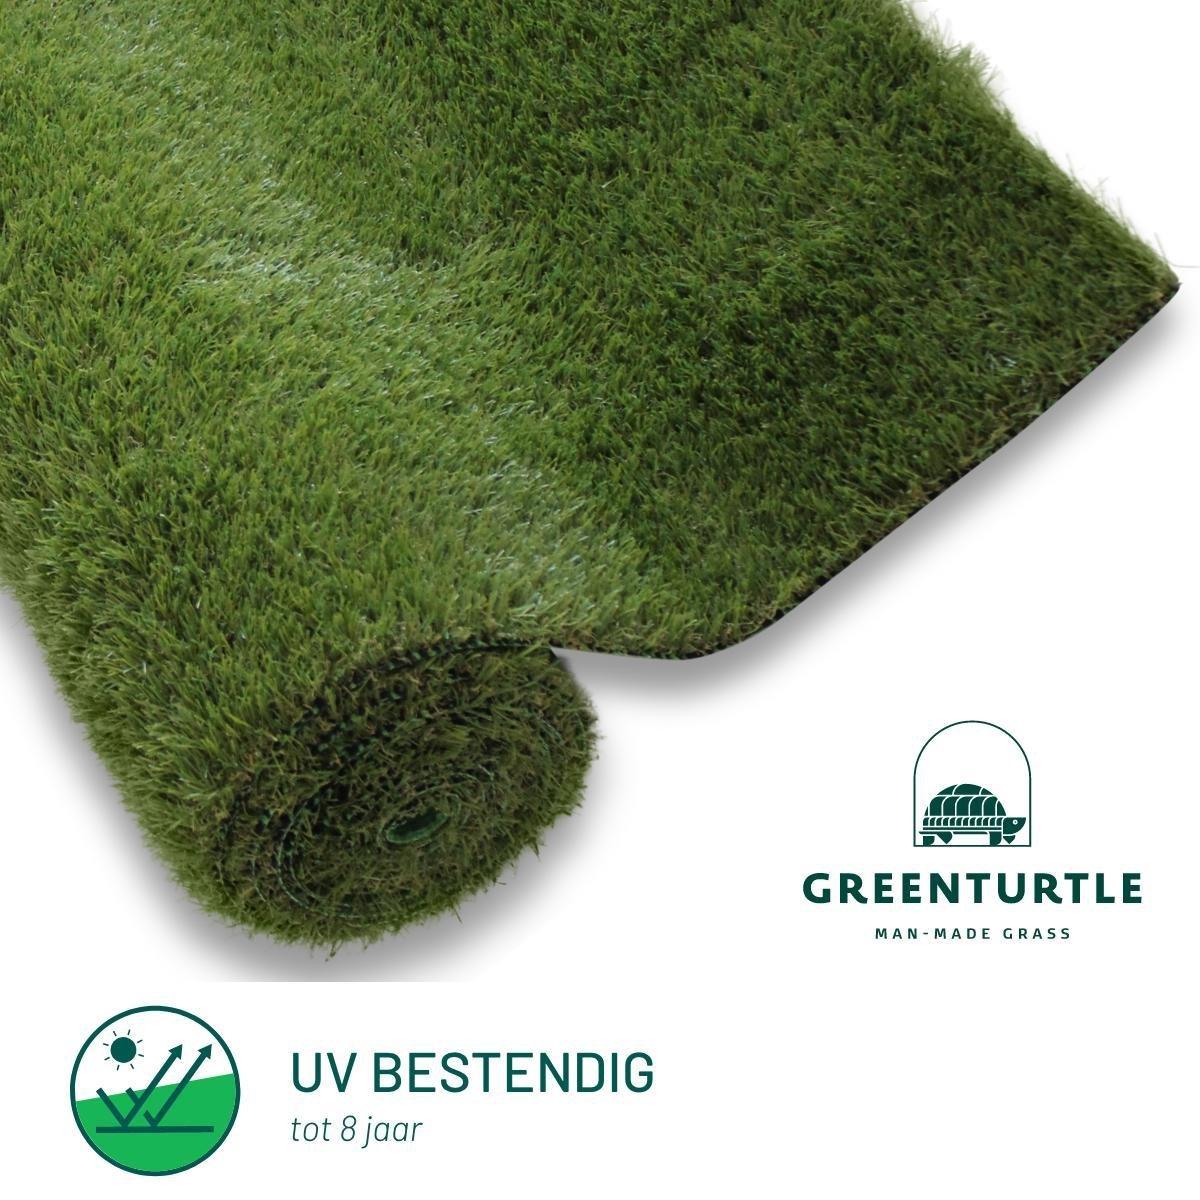 Green Turtle Kunstgras - Grastapijt 133x300cm - 26mm - Central Park - Artificieel Gras - Grastapijt